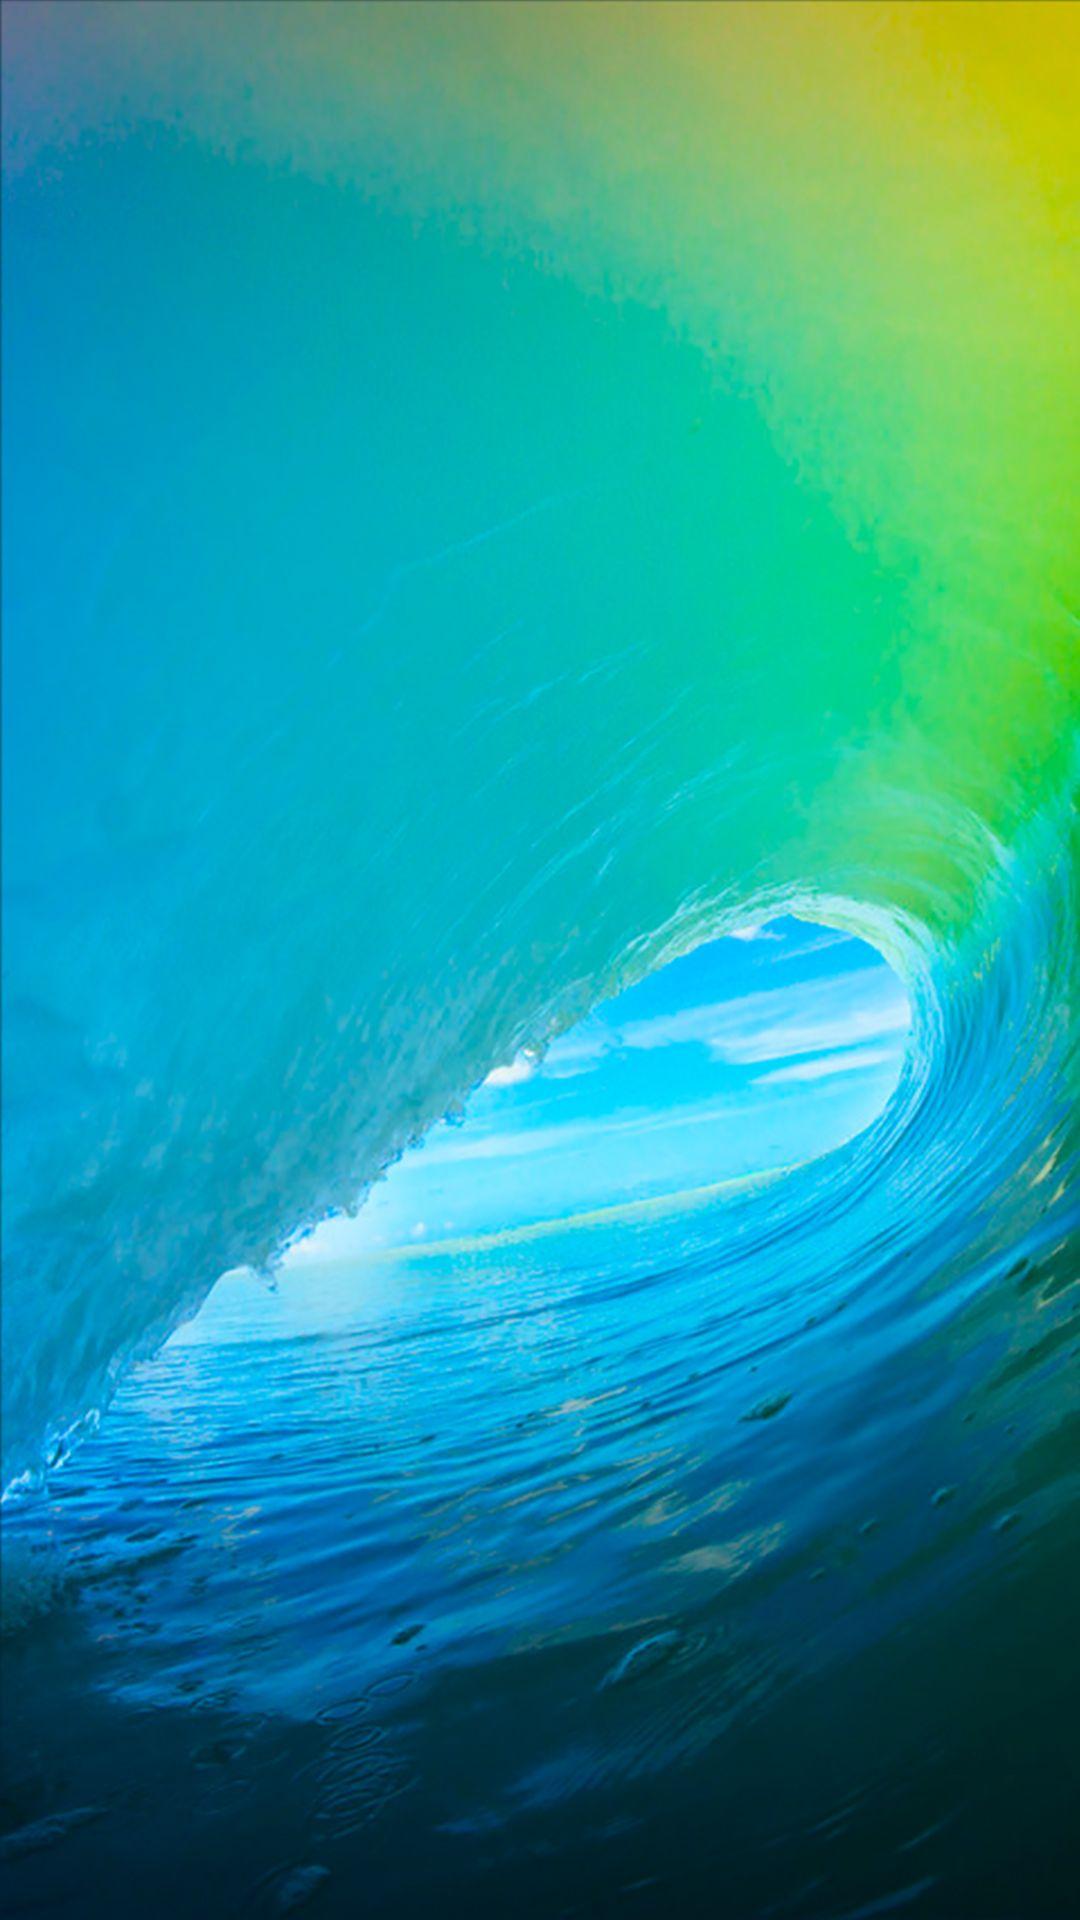 Wallpaper iphone bright - Pure Bright Cyan Ocean Surging Wave Pattern Ios9 Wallpaper Iphone 7 Wallpaper